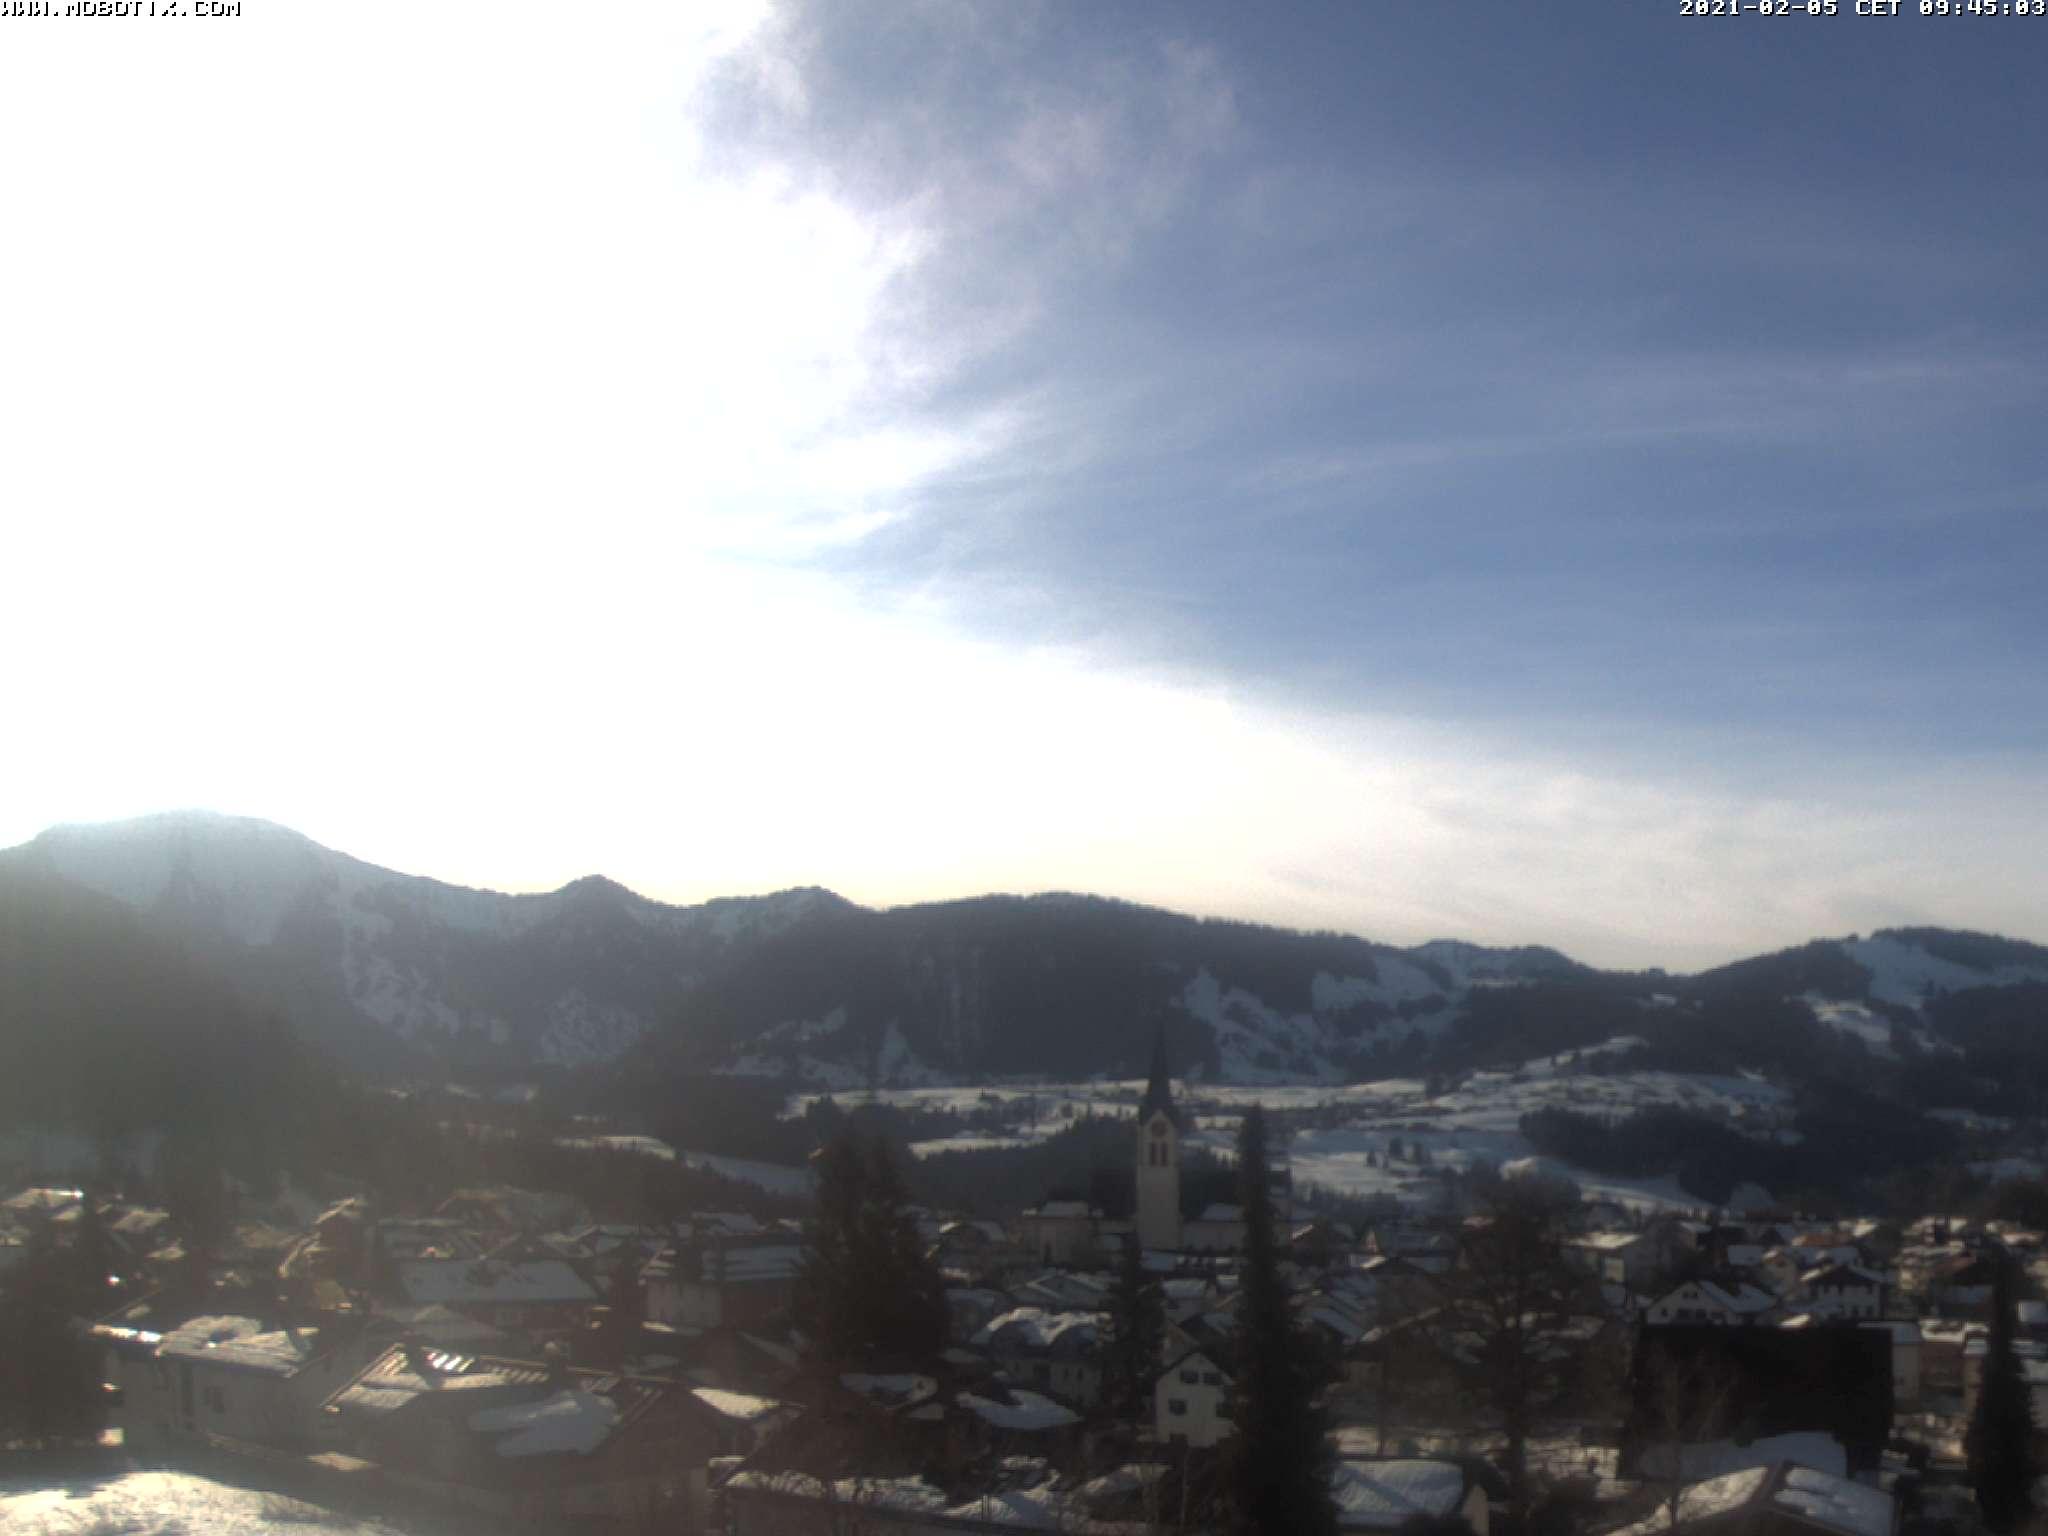 Webcam Ski Resort Oberstaufen - Hochgrat cam 4 - Bavaria Alps - Allgäu